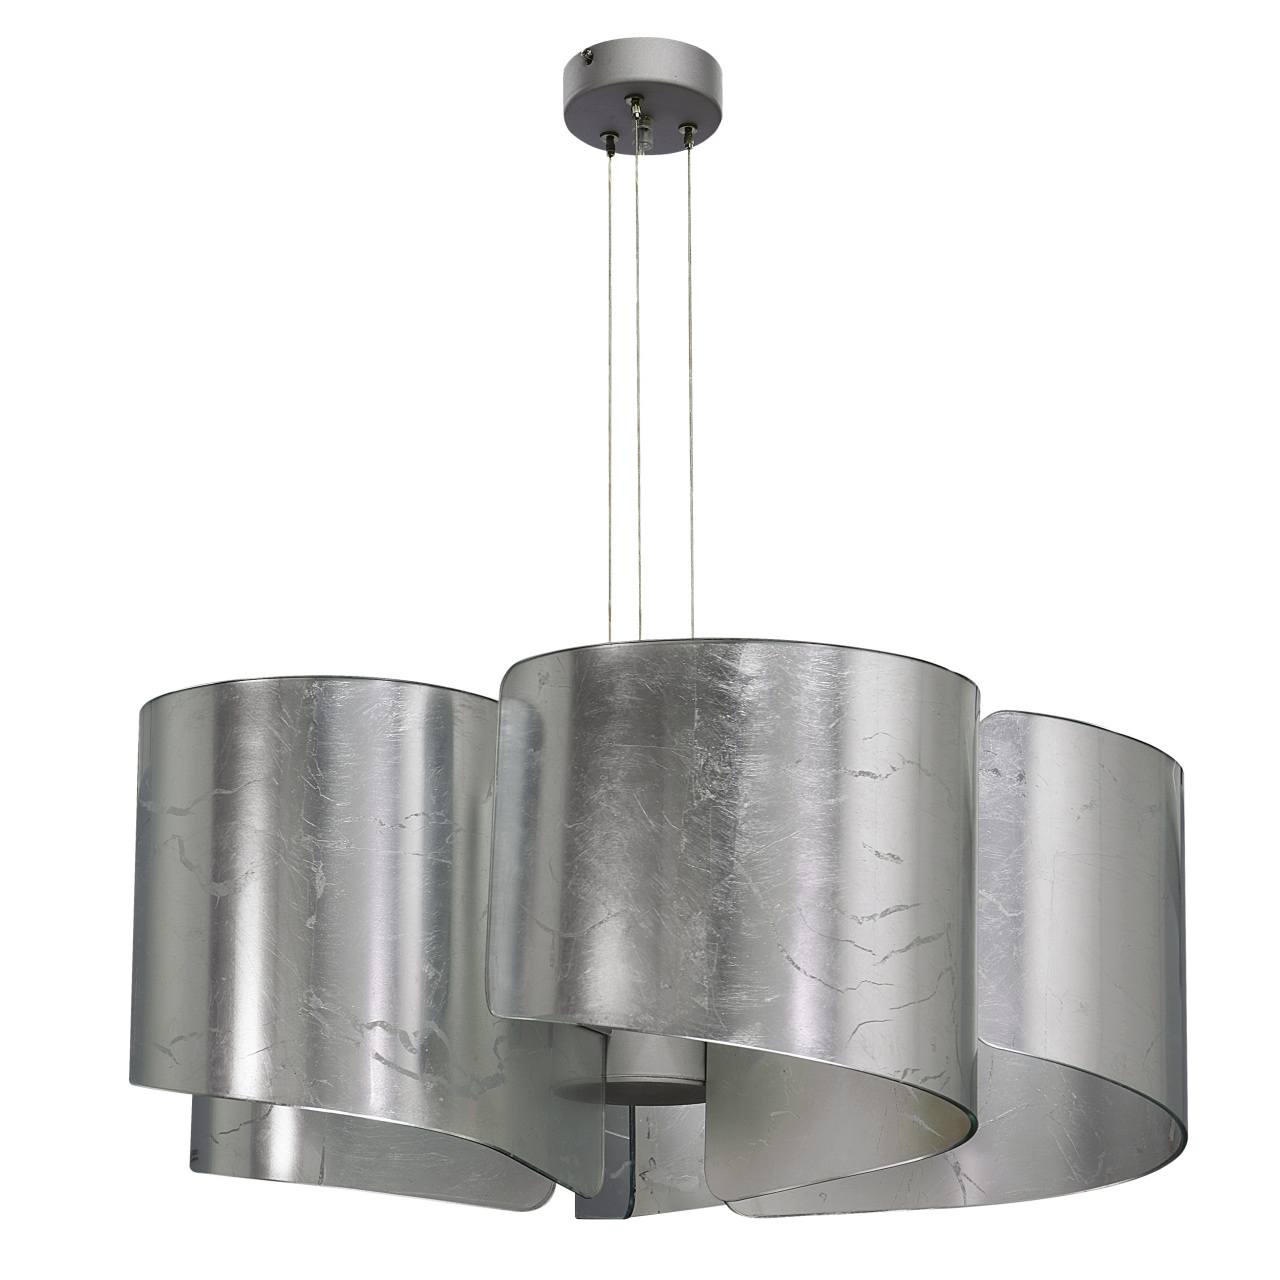 Люстра подвесная Pittore 5х40W E27 silver Lightstar 811154